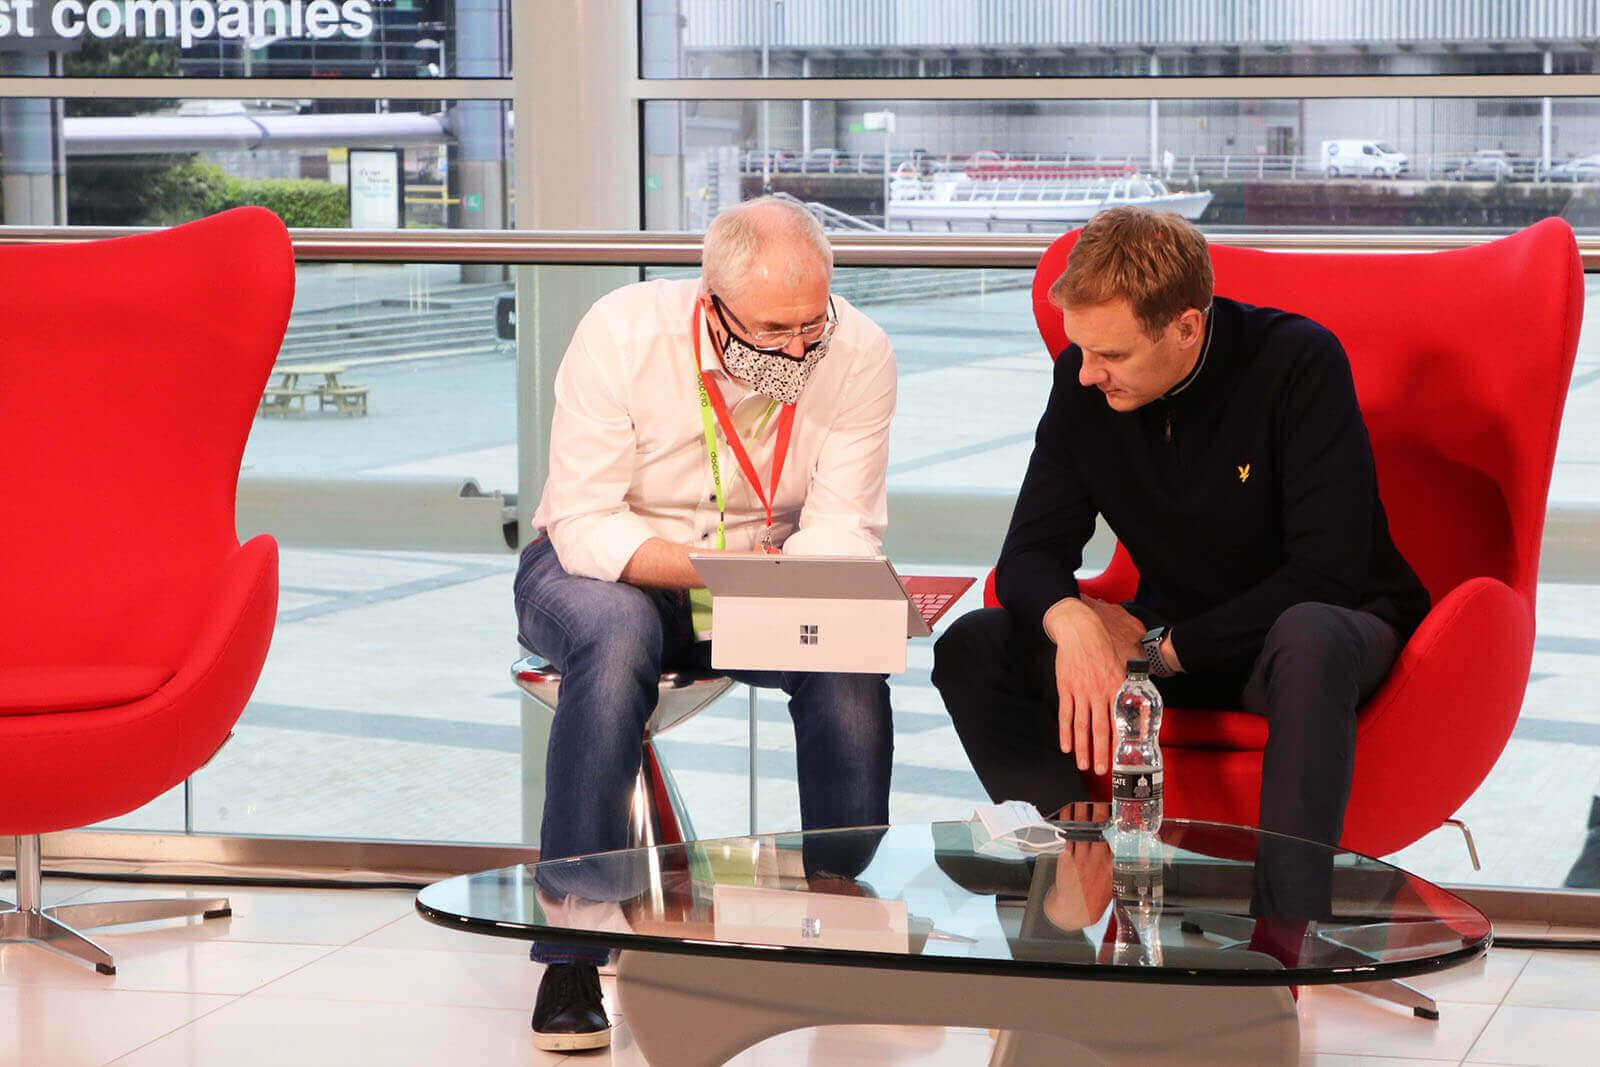 Best Companies CEO Jonathan Austin and TV Presenter Dan Walker on set at Best Companies Live